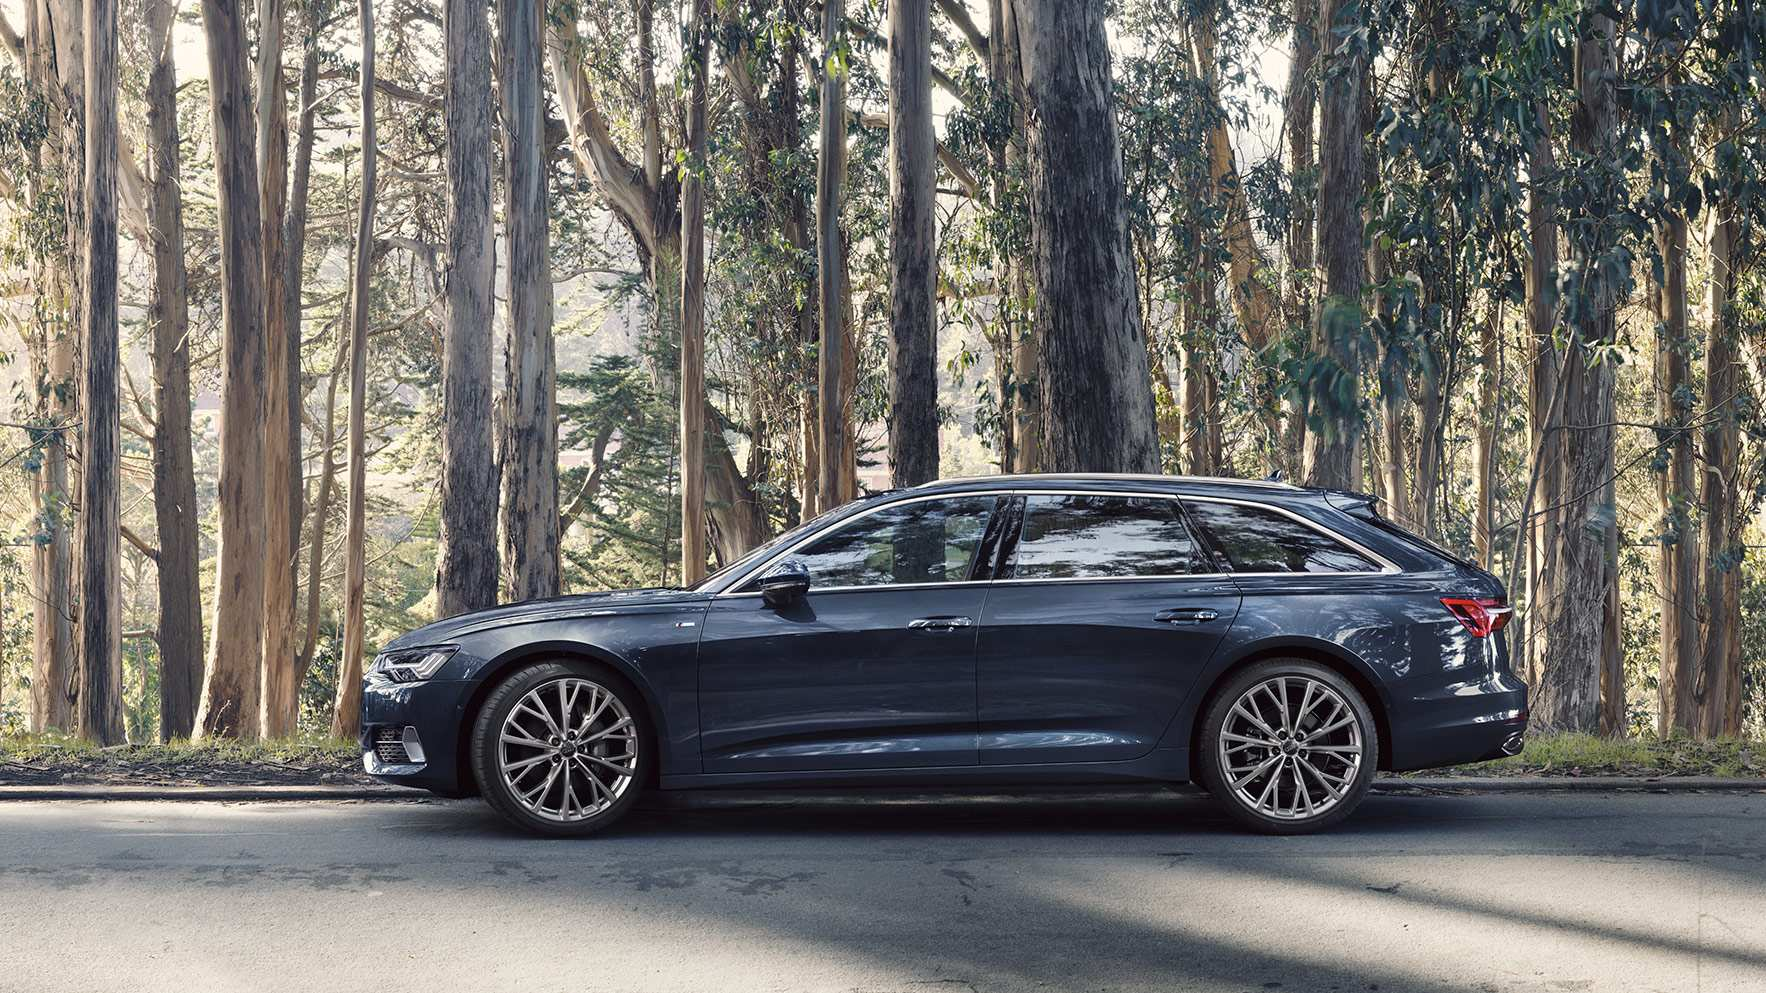 96 All New Audi Motoren 2020 Pictures for Audi Motoren 2020